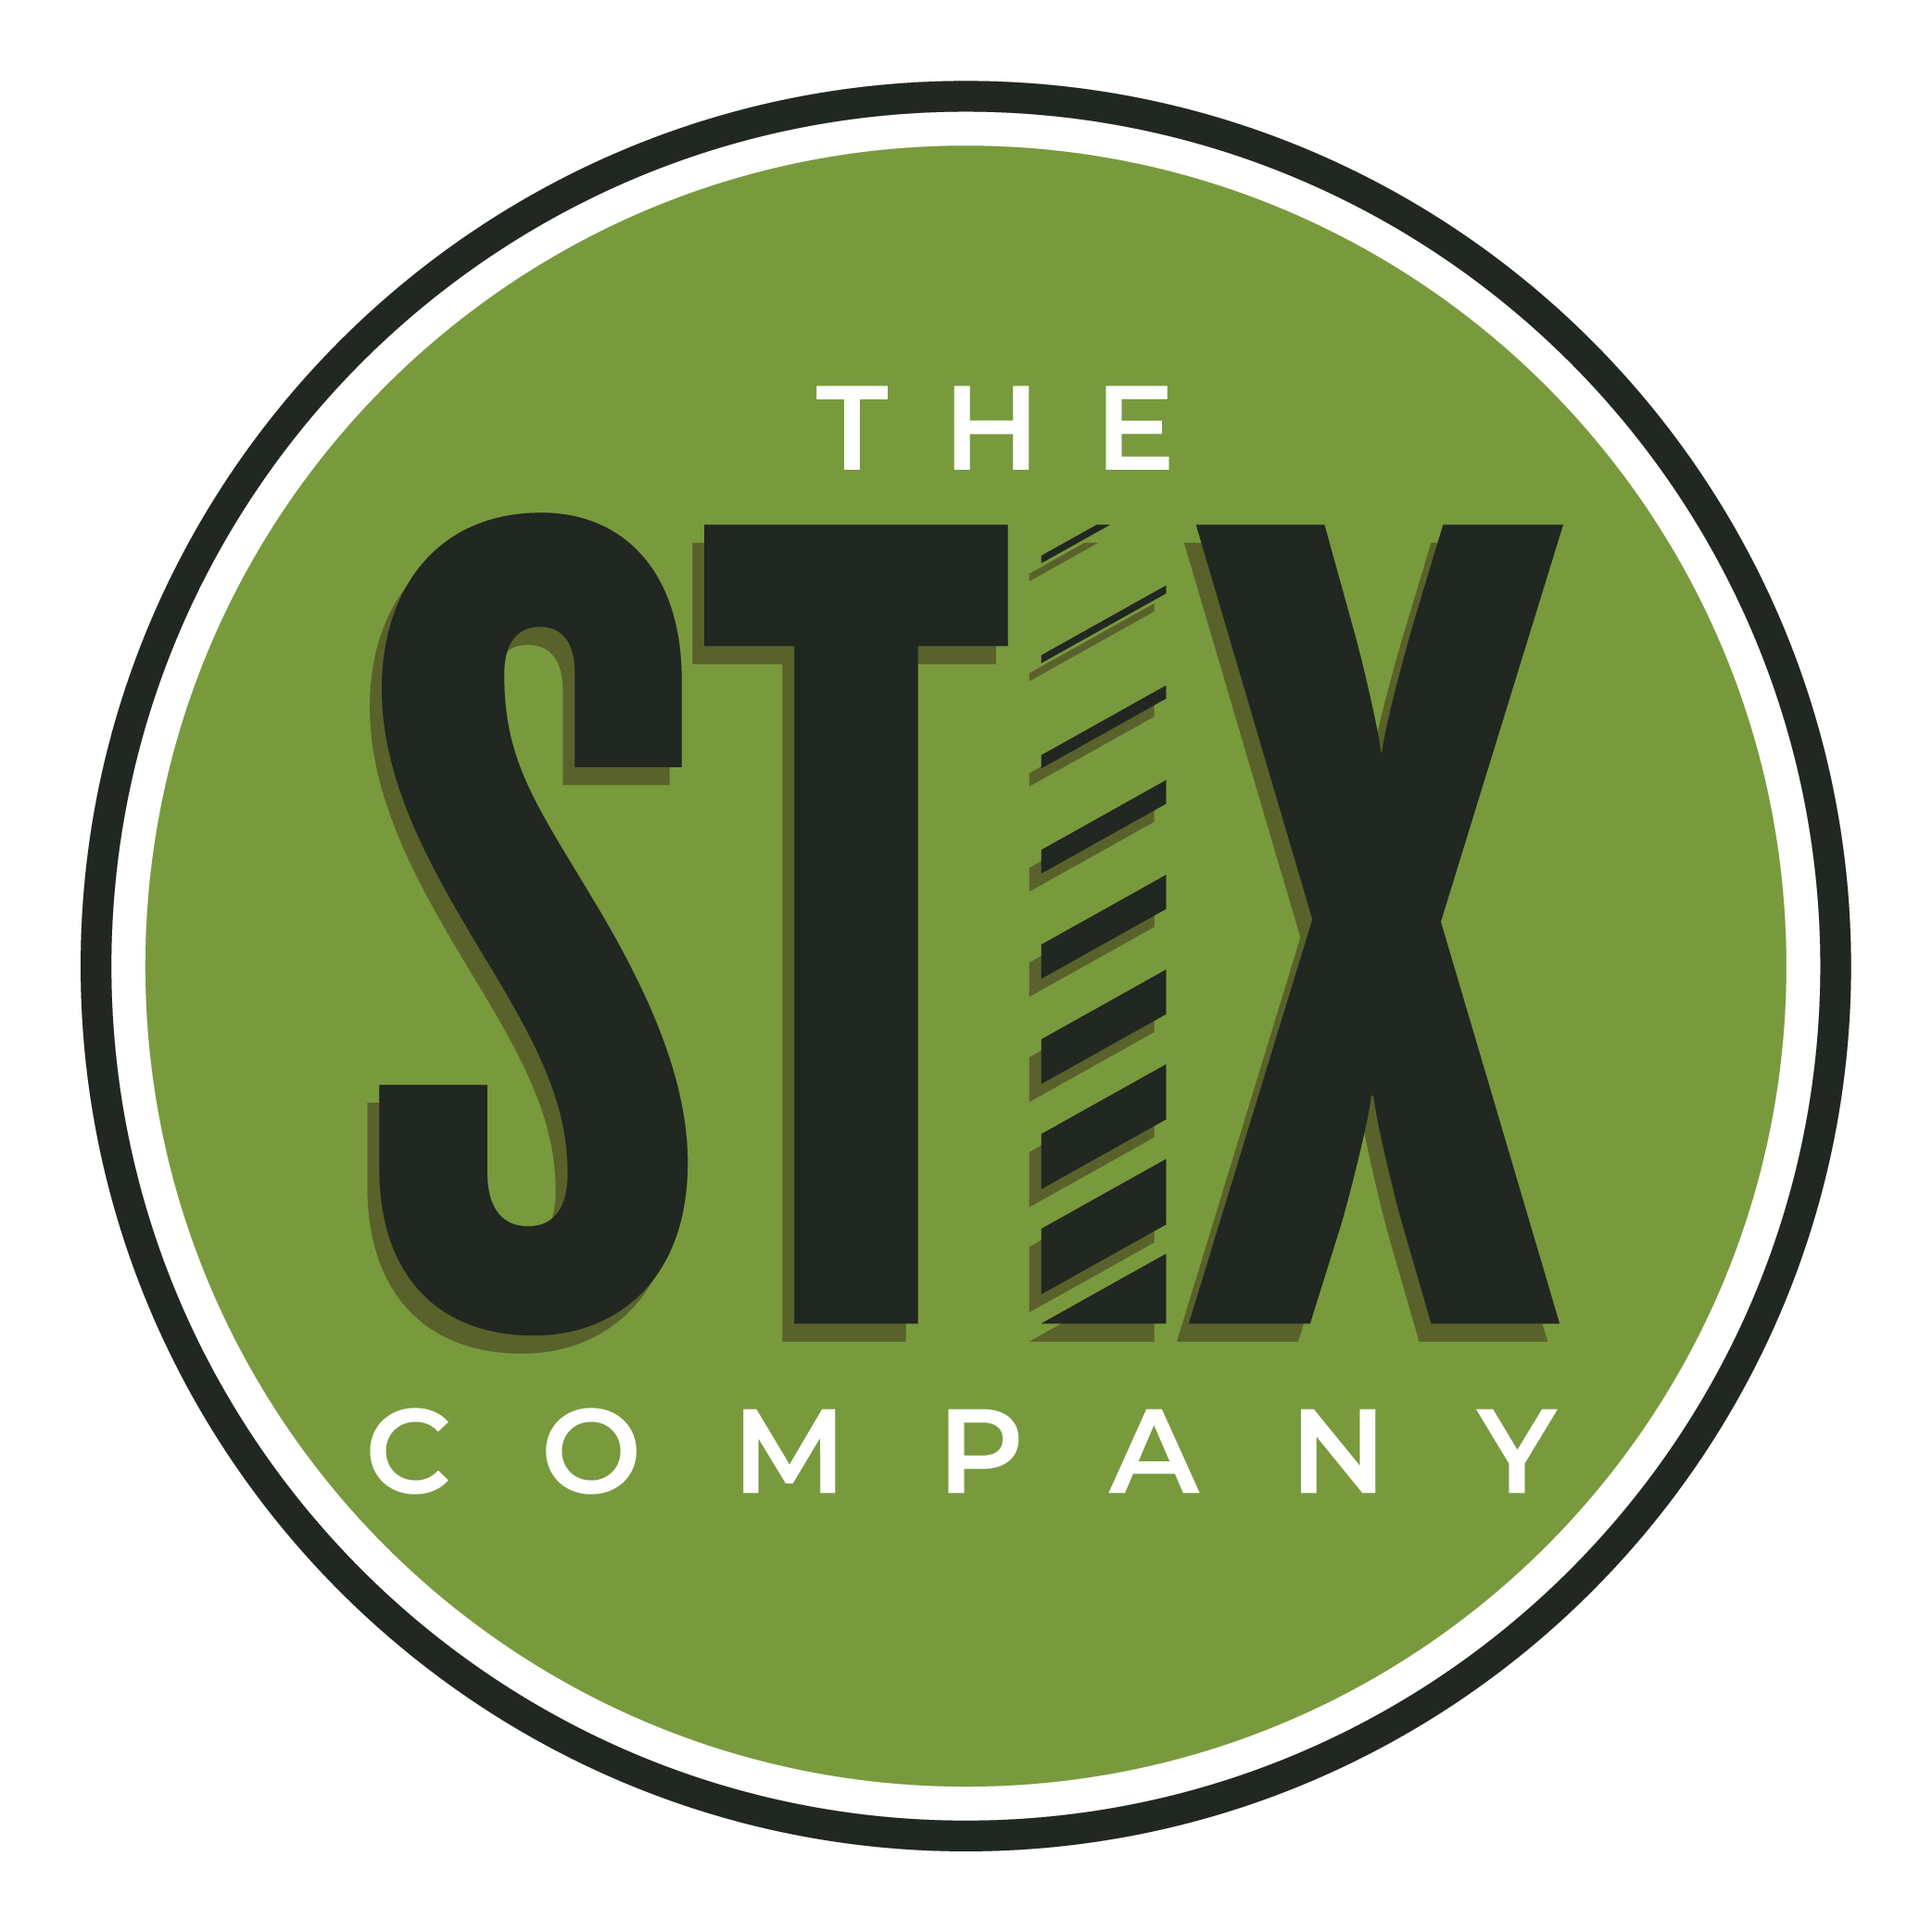 the stix company logo